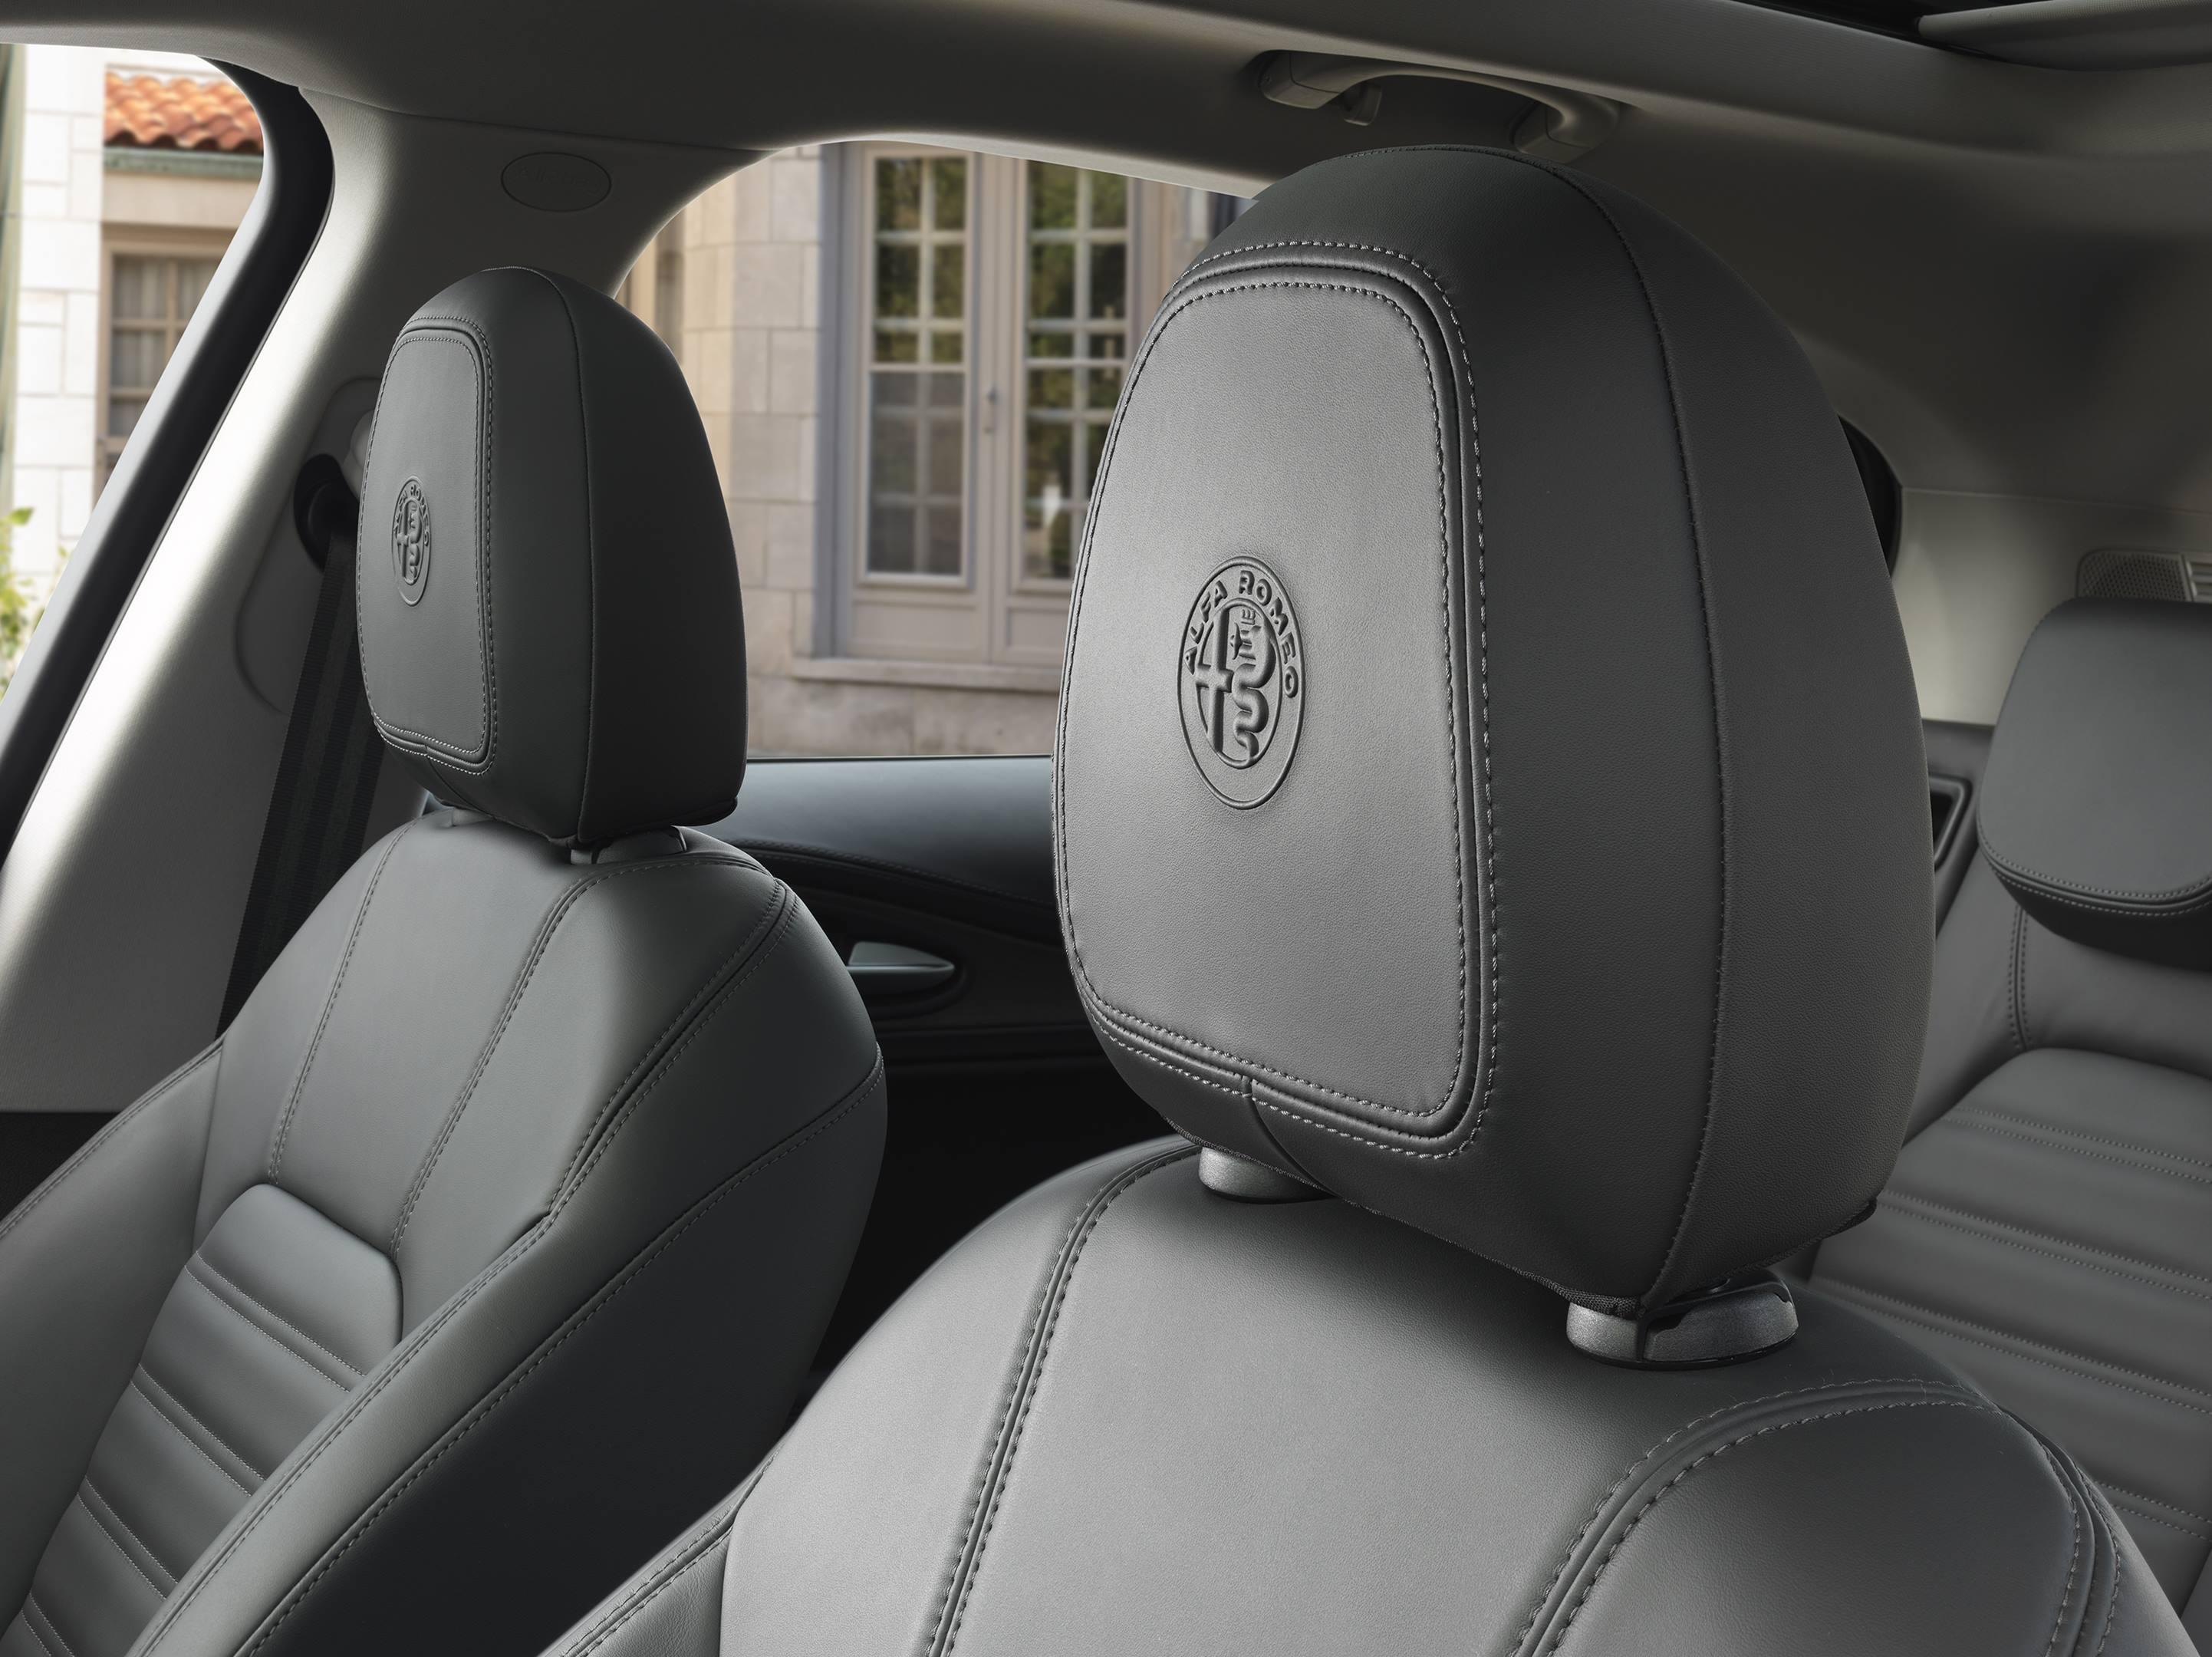 2018 Alfa Romeo Stelvio seat detail